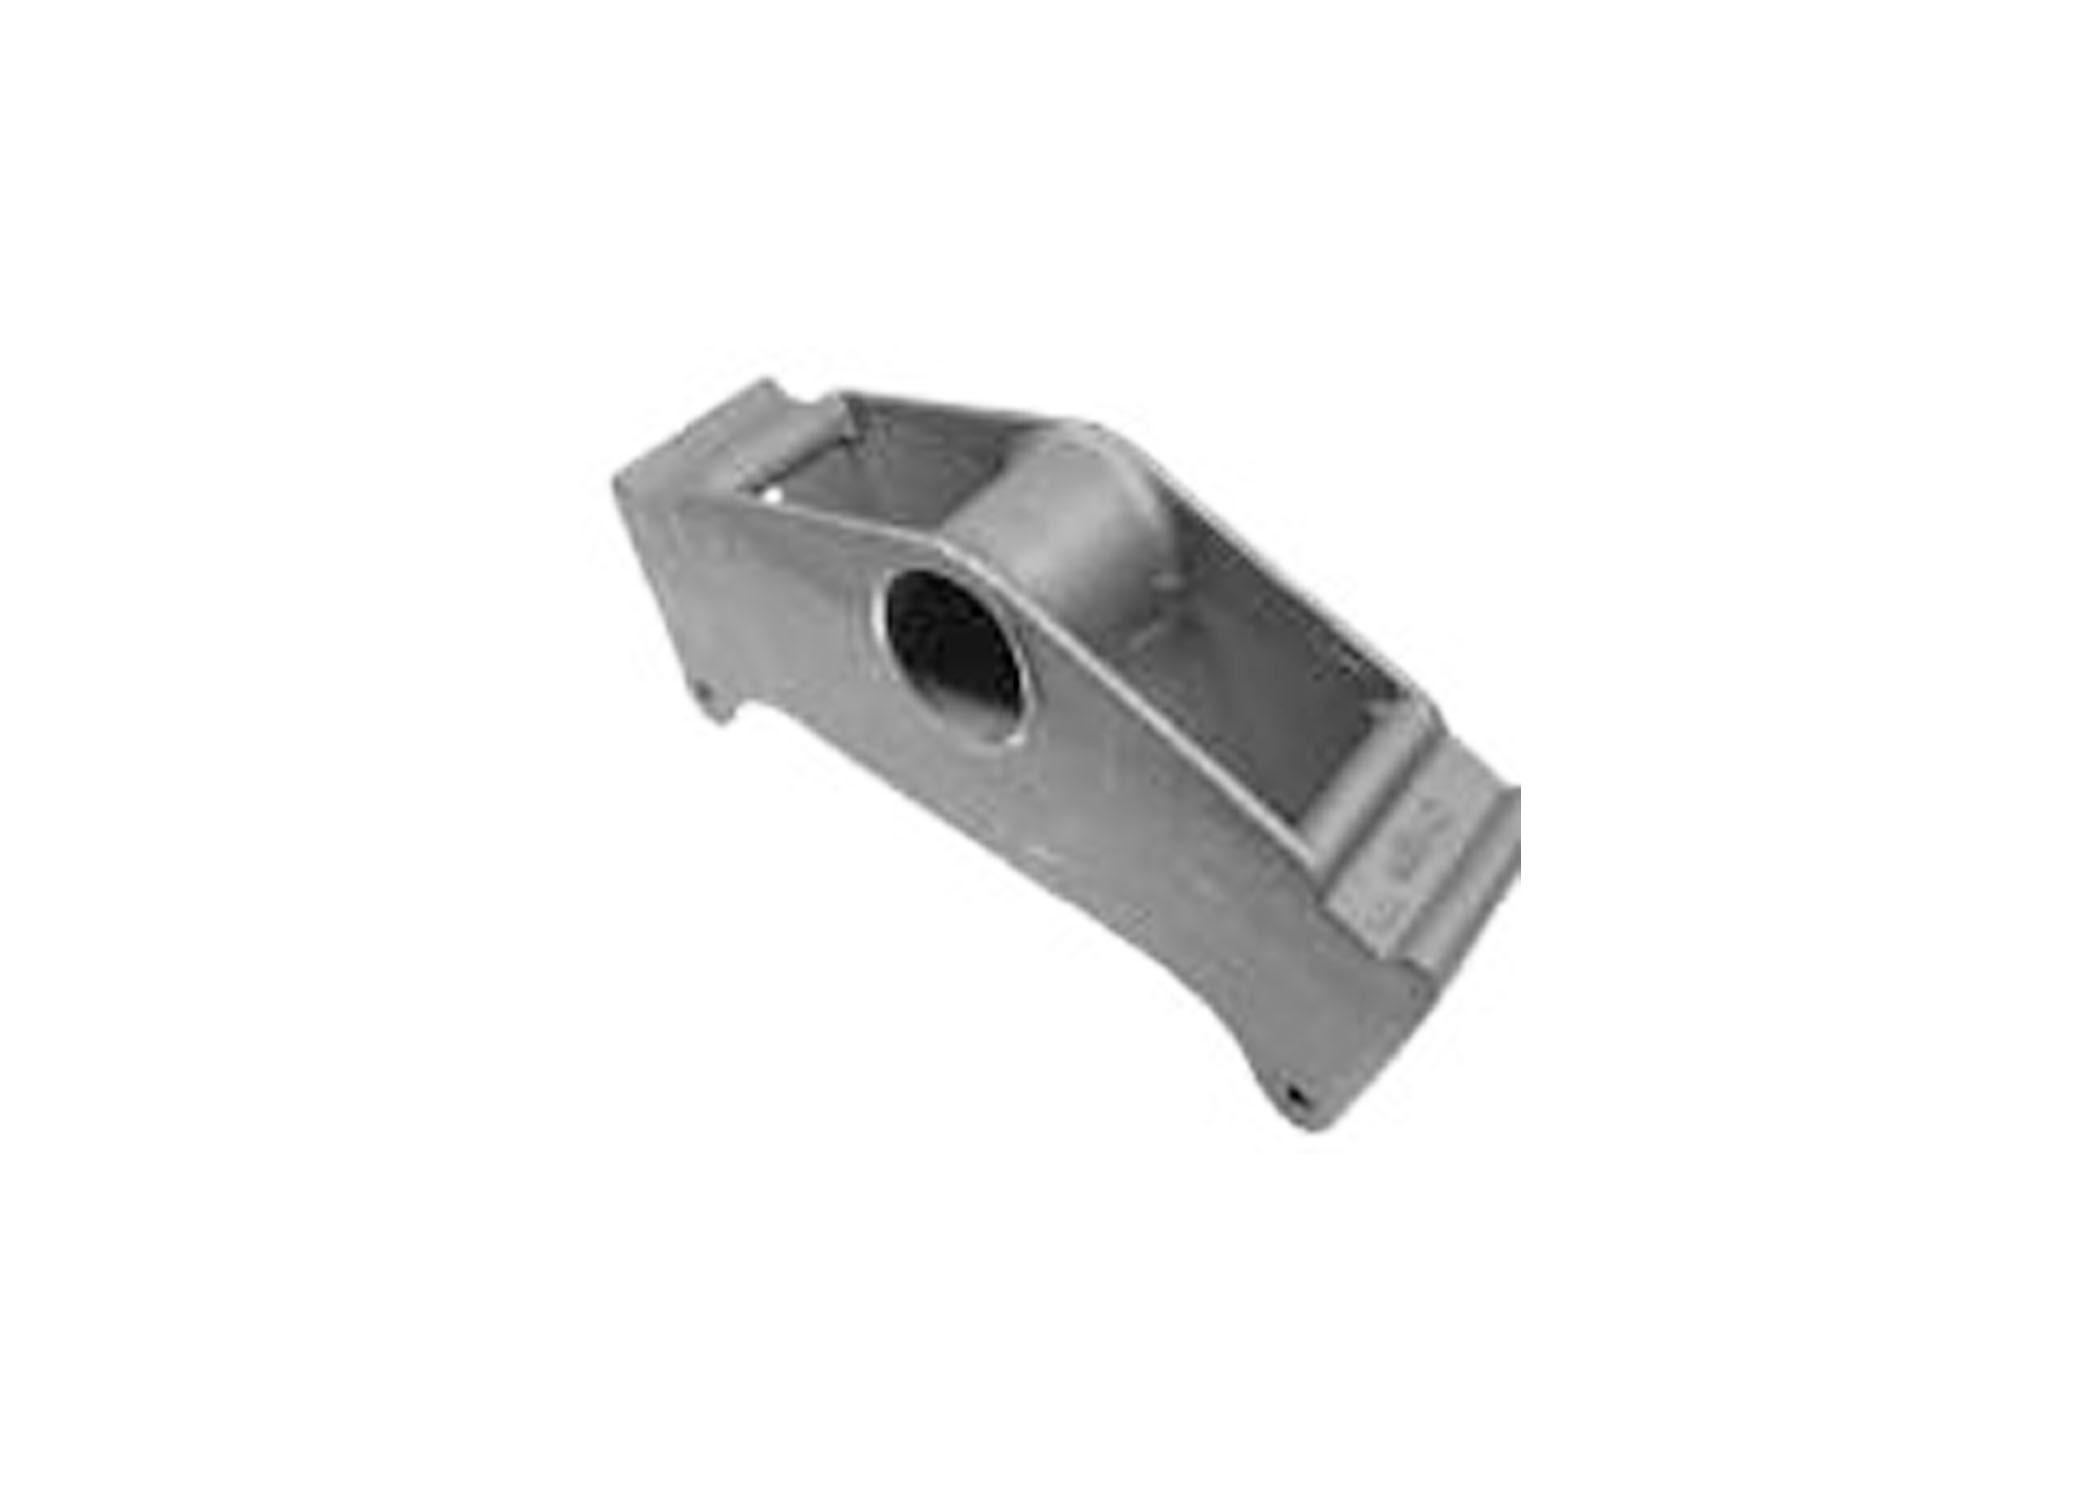 REYCO EQUALIZER (MODEL 21B) - Suspension Parts/Kits - Trailer Parts